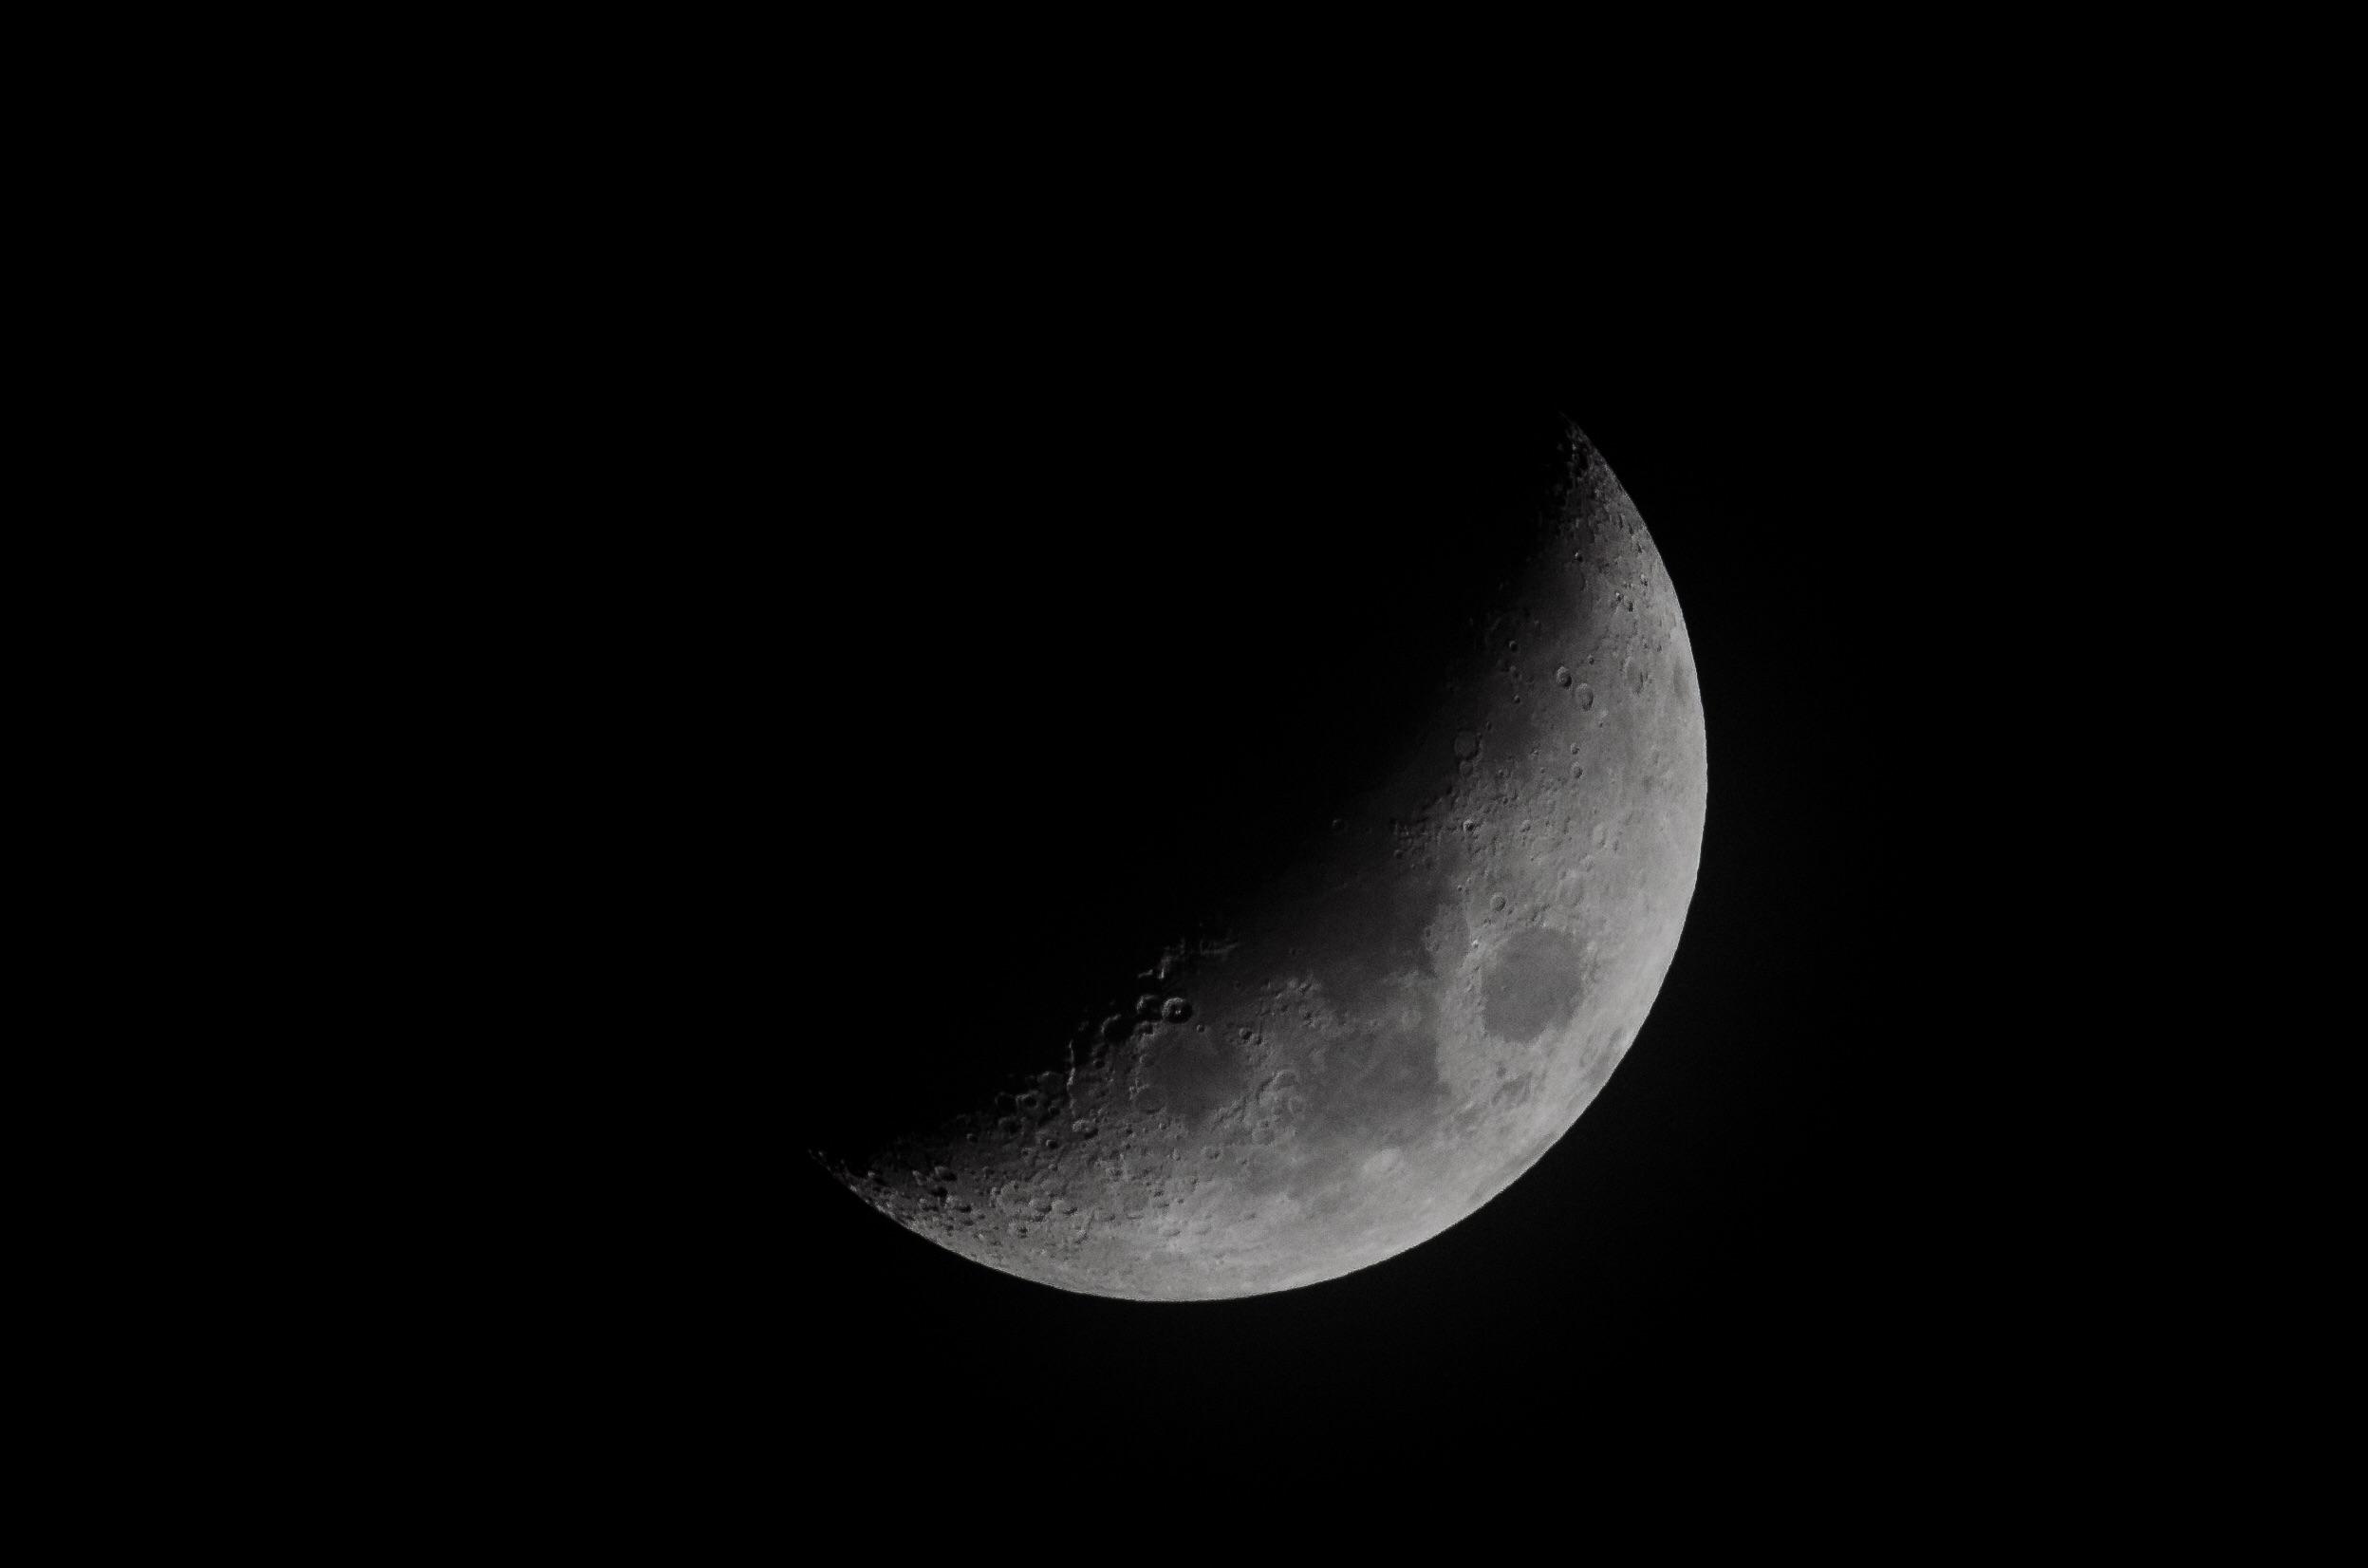 Misty Moon  Nikon D7000 ISO 800 600mm f/14 1/250sec.